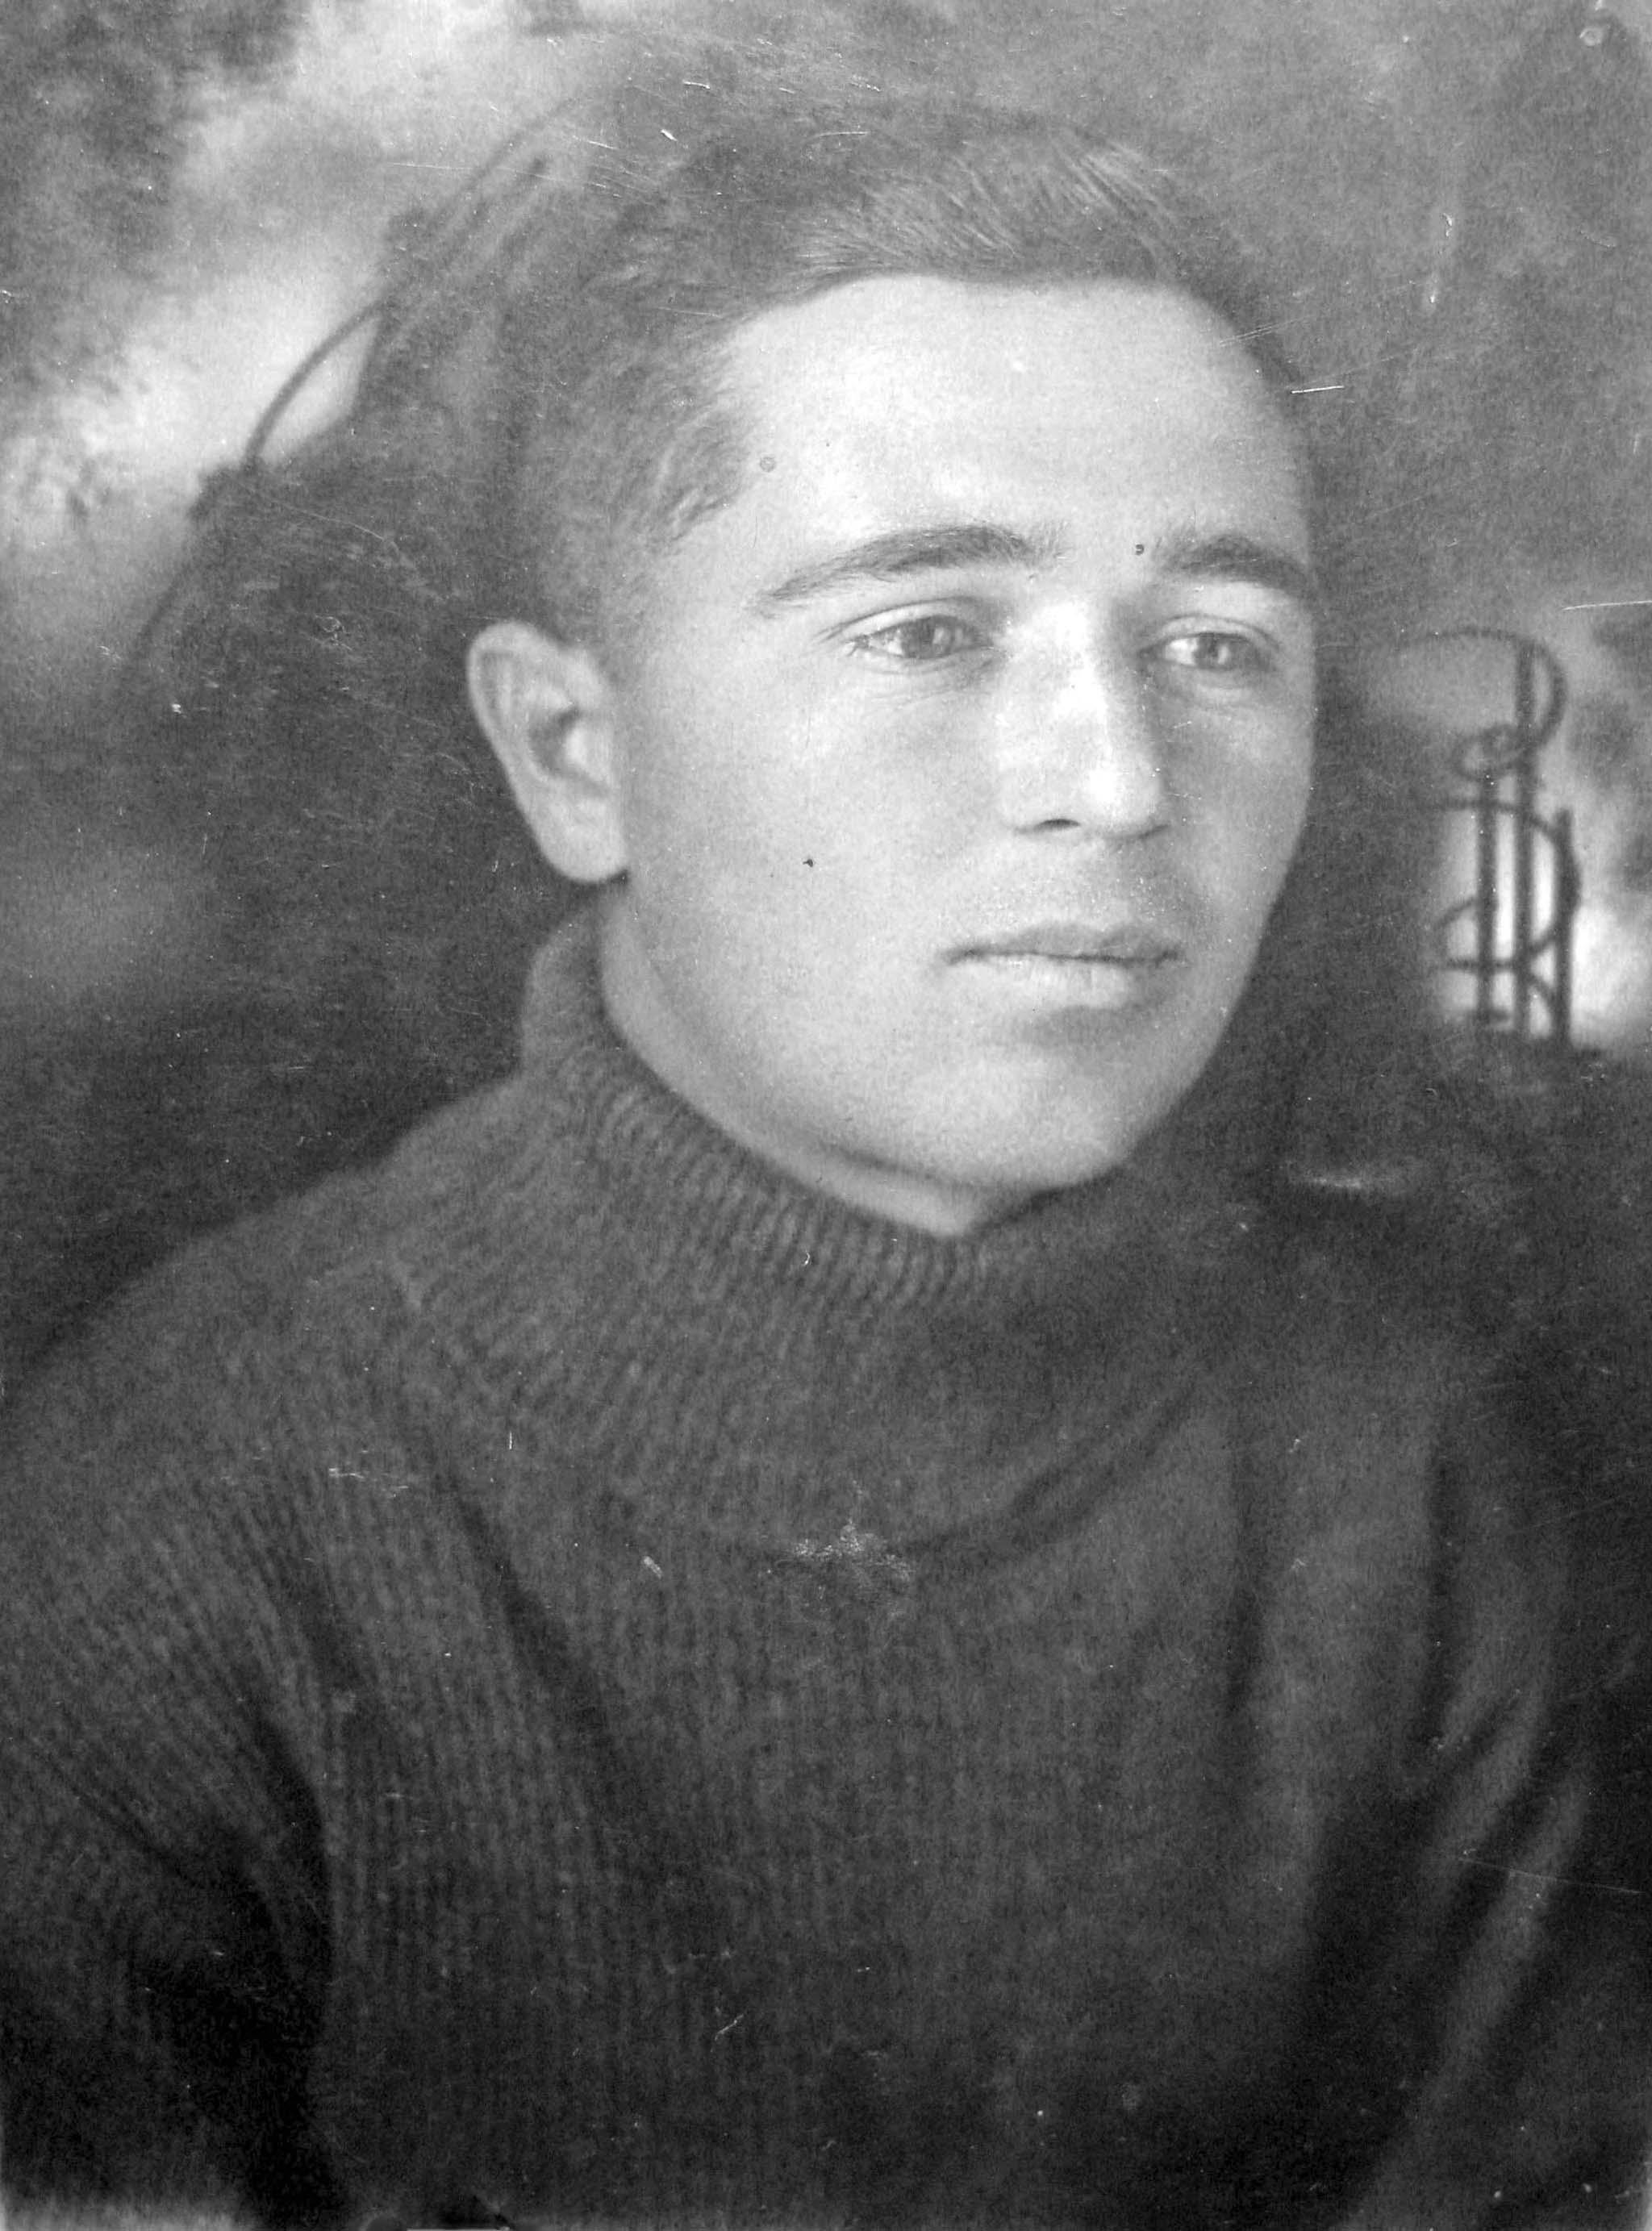 Vladimir Serdyukov